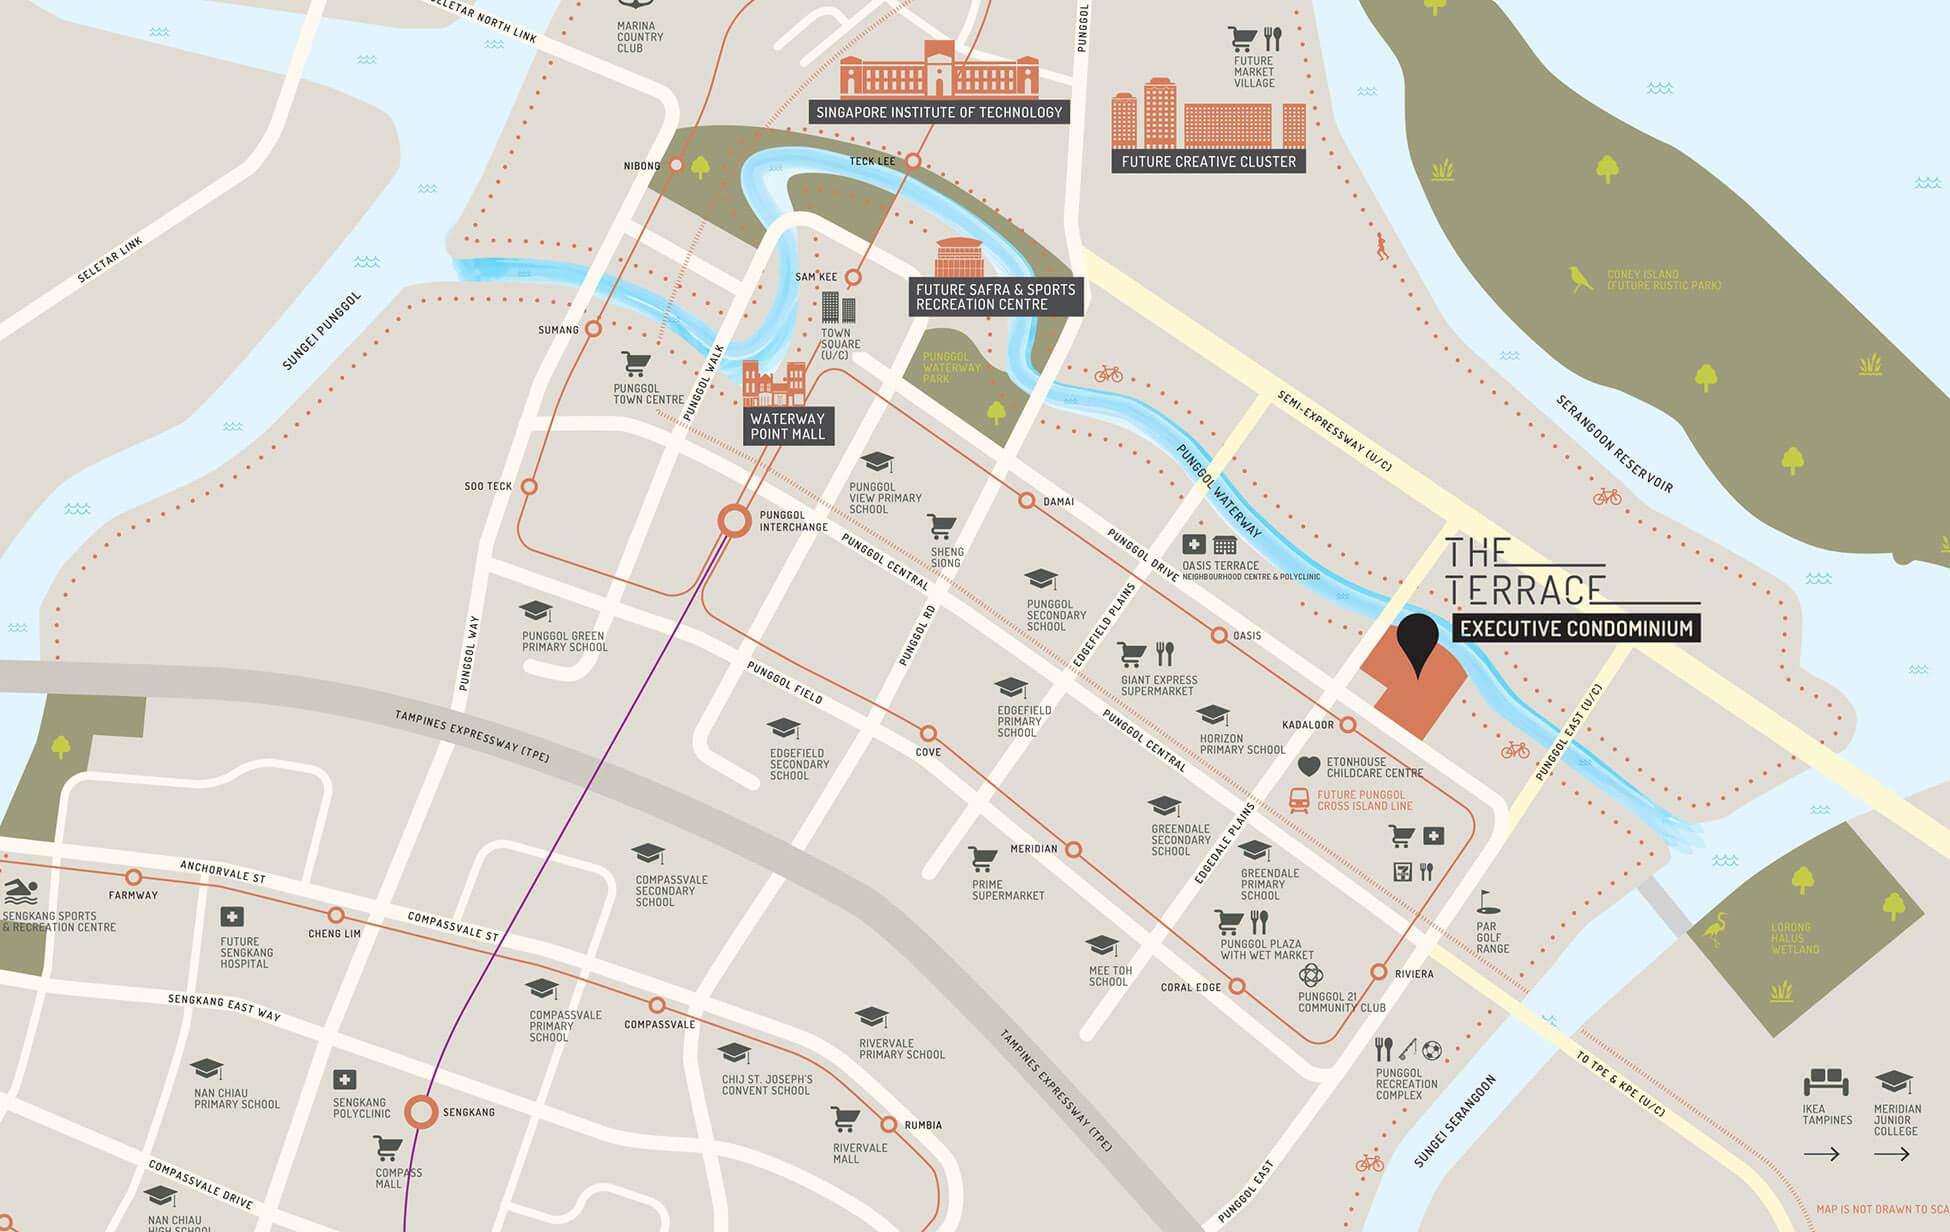 The Terrace Exec Condo Singapore Location Map